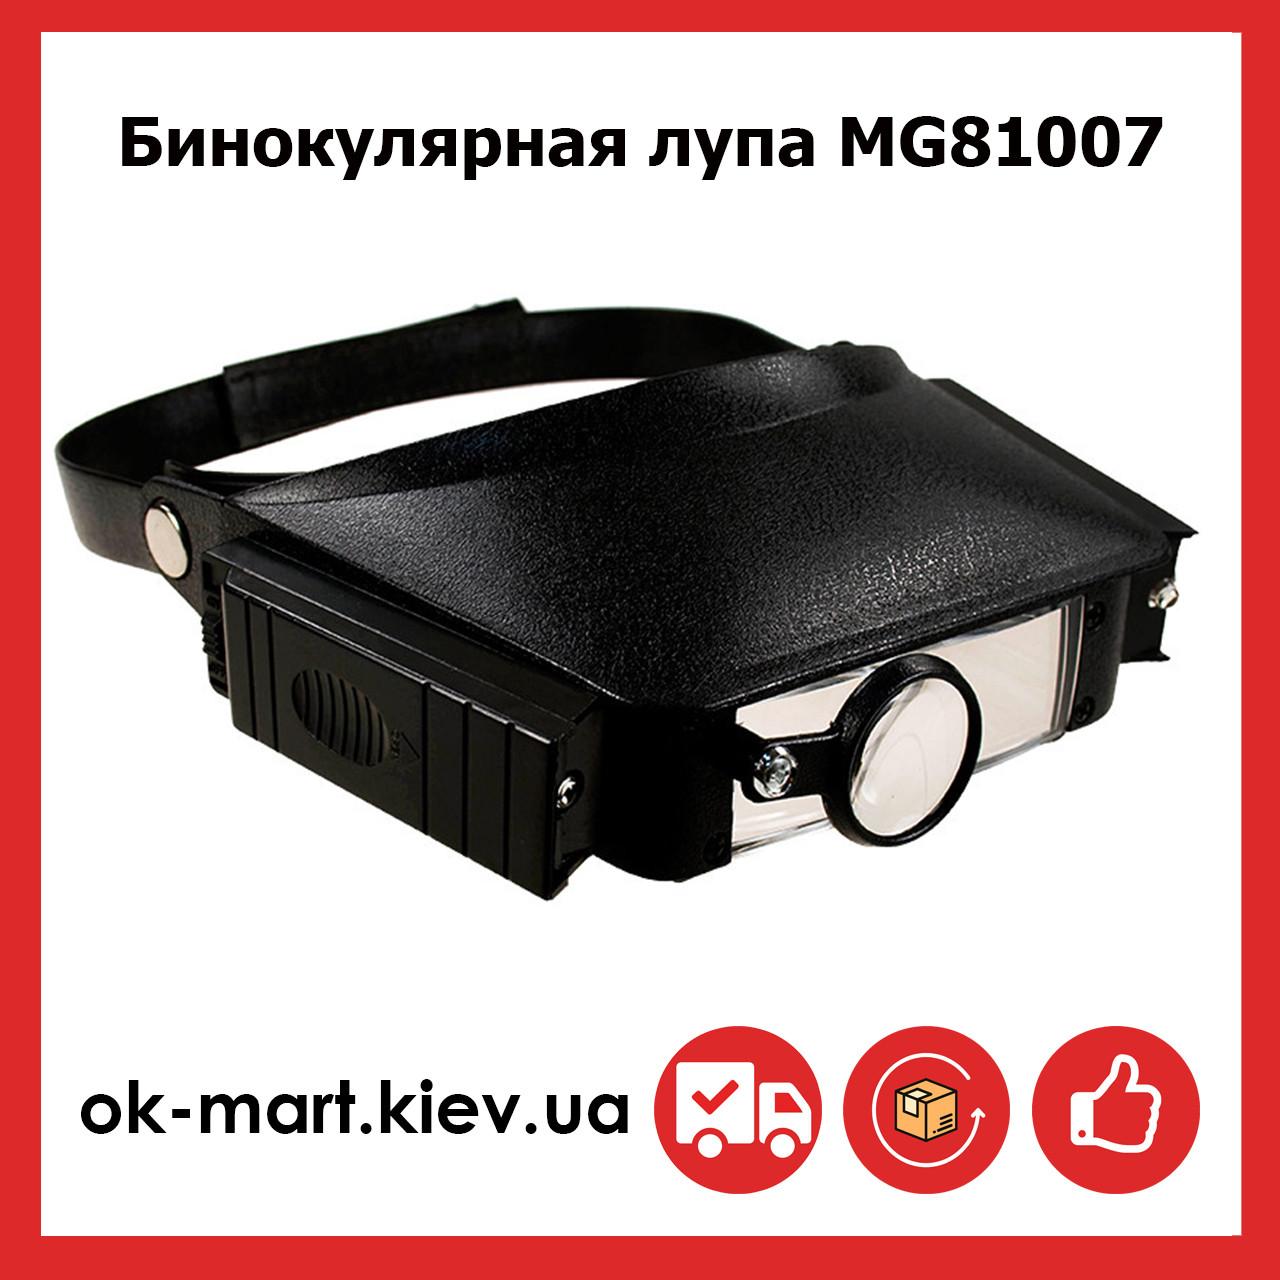 Бинокулярные очки MG81007 с LED подсветкой, увеличение:1,5Х; 3Х; 6,5Х; 8Х, фото 1